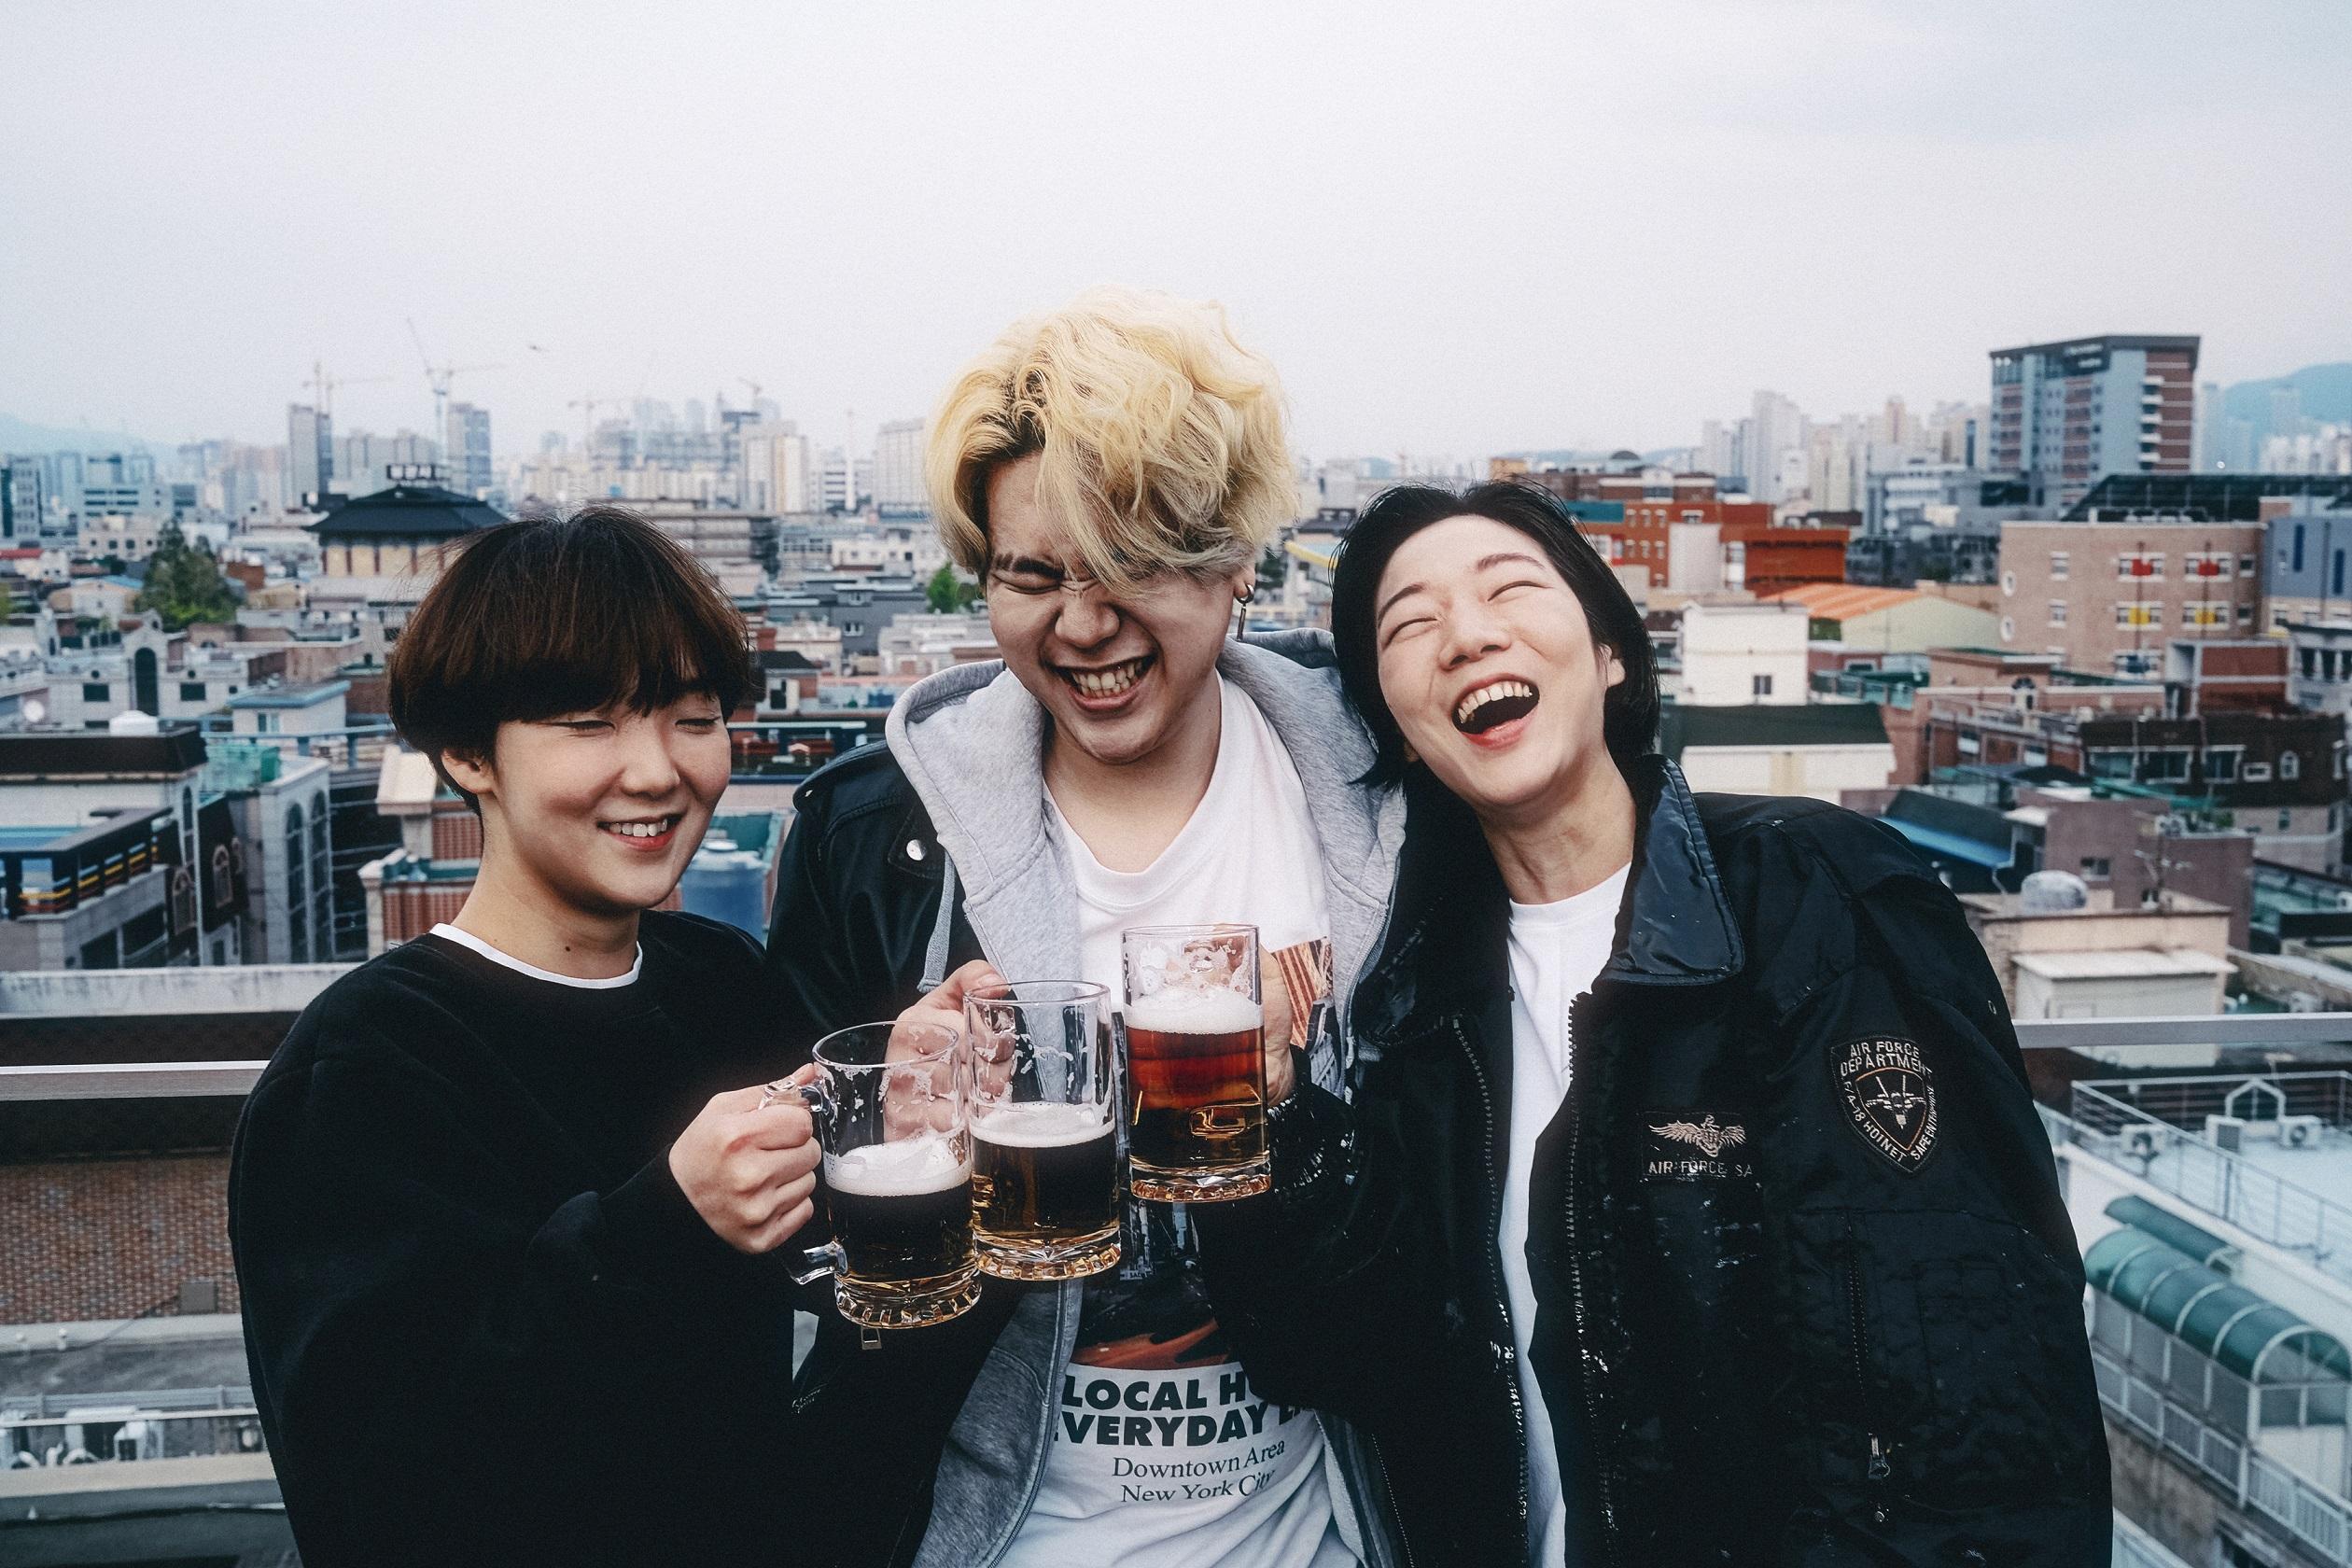 Drinking-Boys-and-Girls-Choir-new